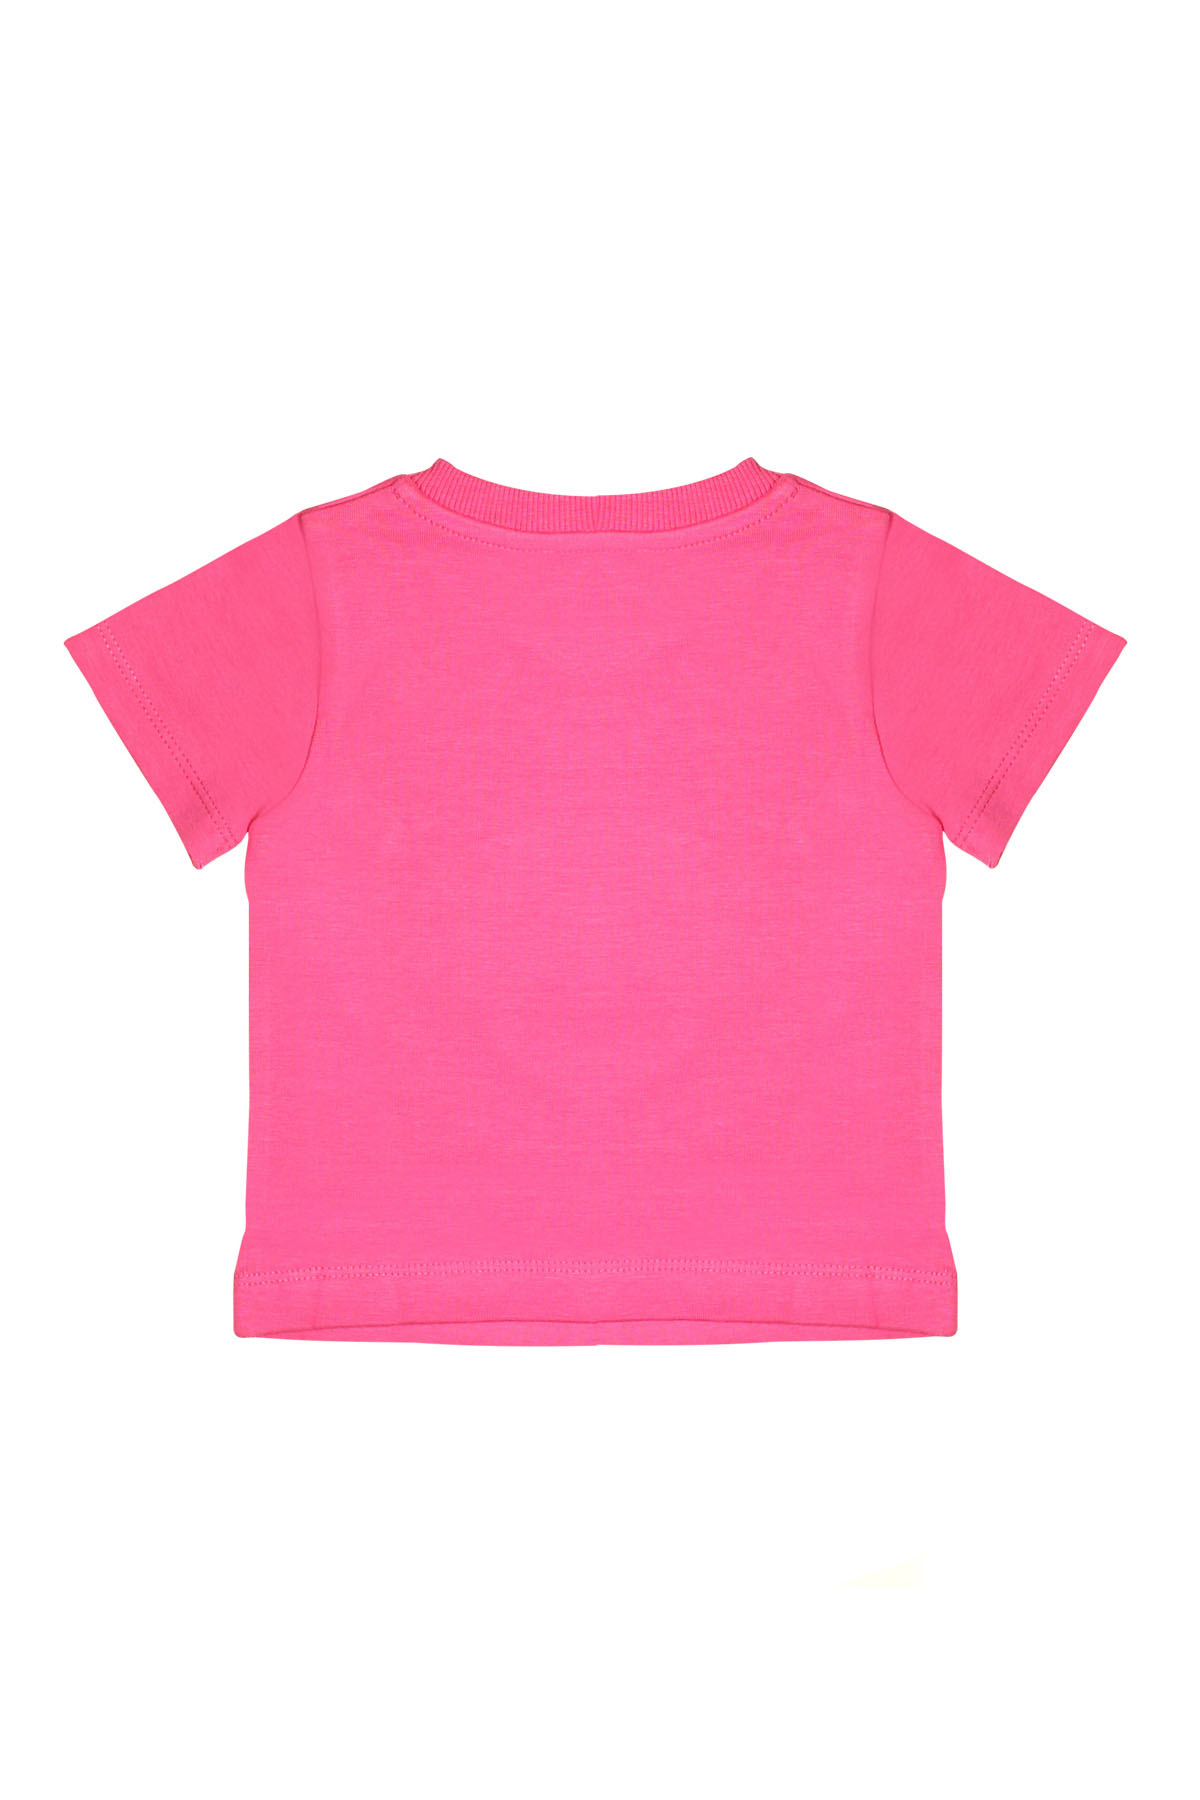 T-SHIRT PINK FOR GIRL MOSCHINO KIDS MOSCHINO KIDS | 8 | MTM01HLBA1050875